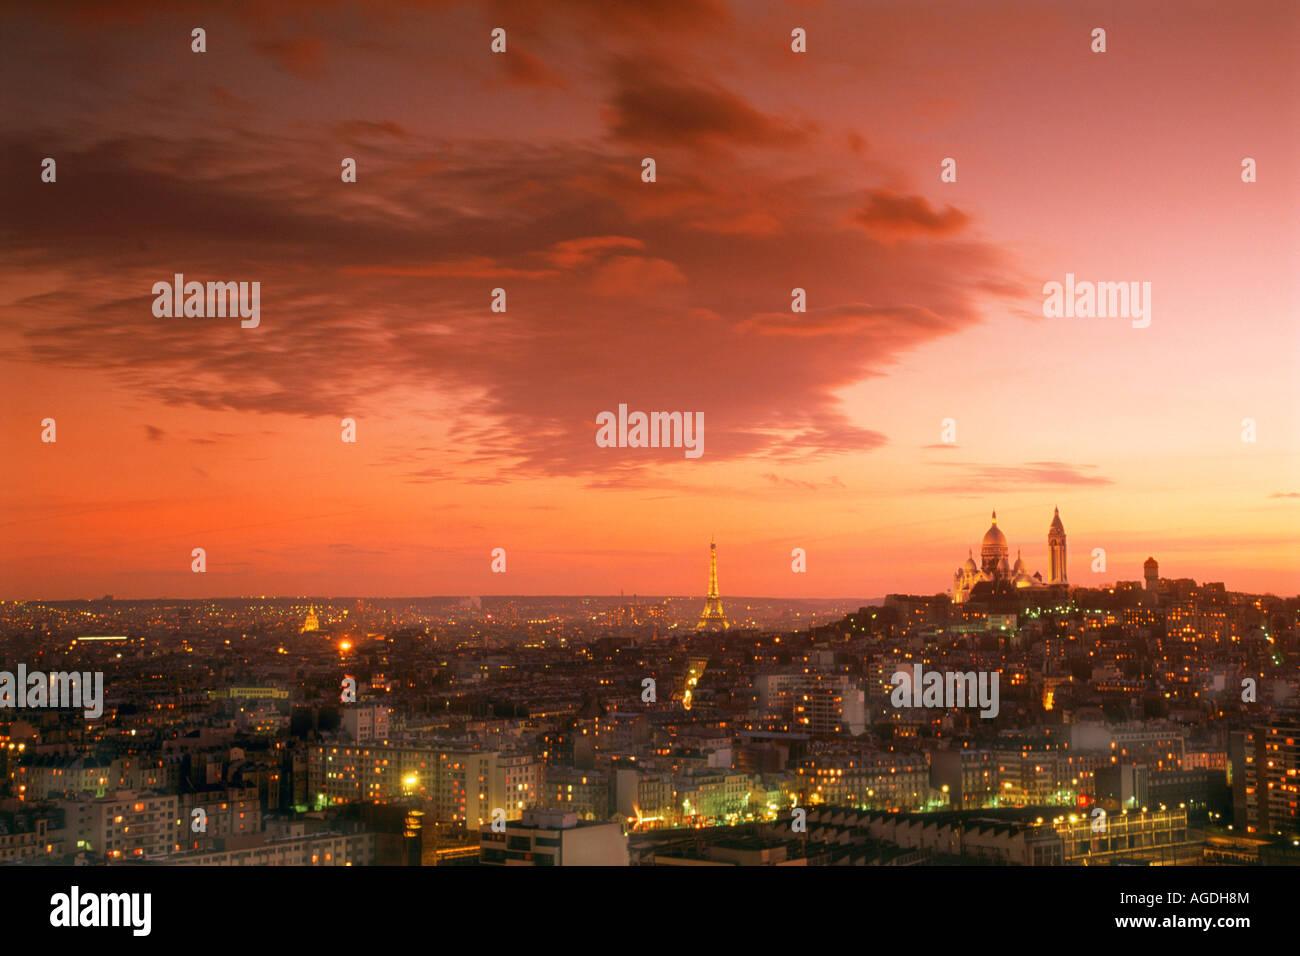 Sacre-Coeur and Eiffel Tower above Paris skyline at dusk Stock Photo